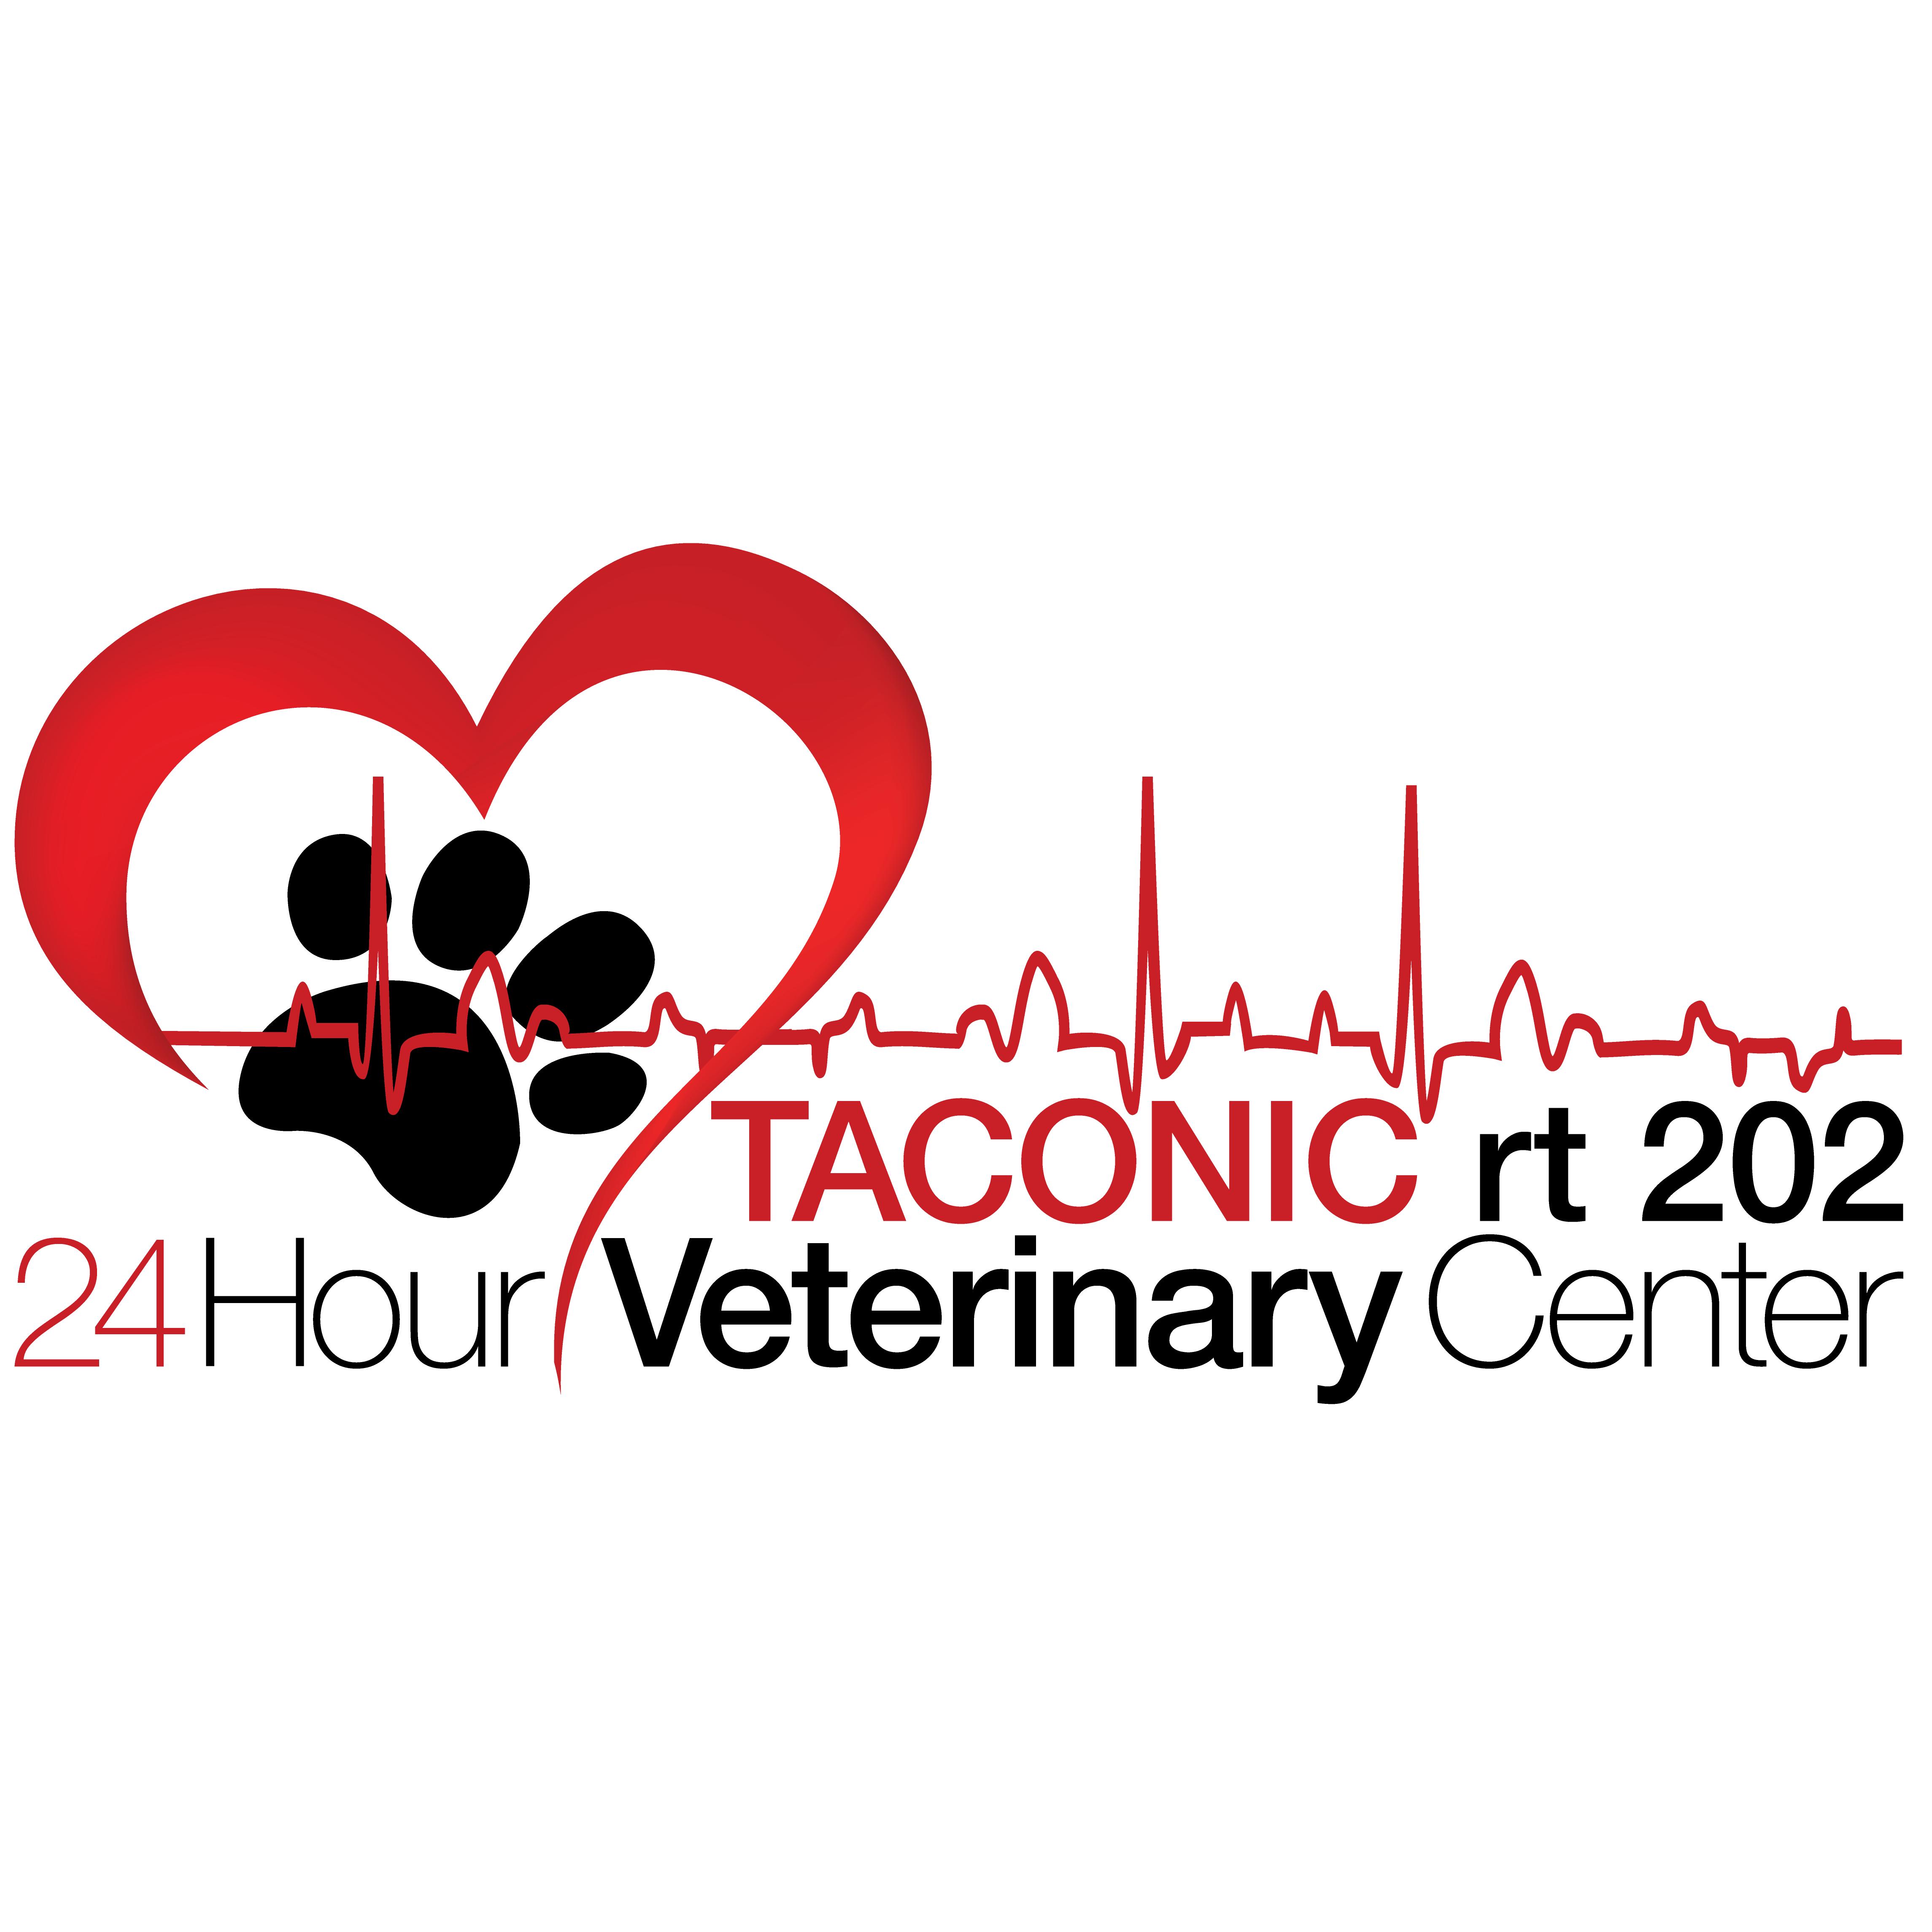 Taconic Rt 202 - 24 Hour Veterinary Center